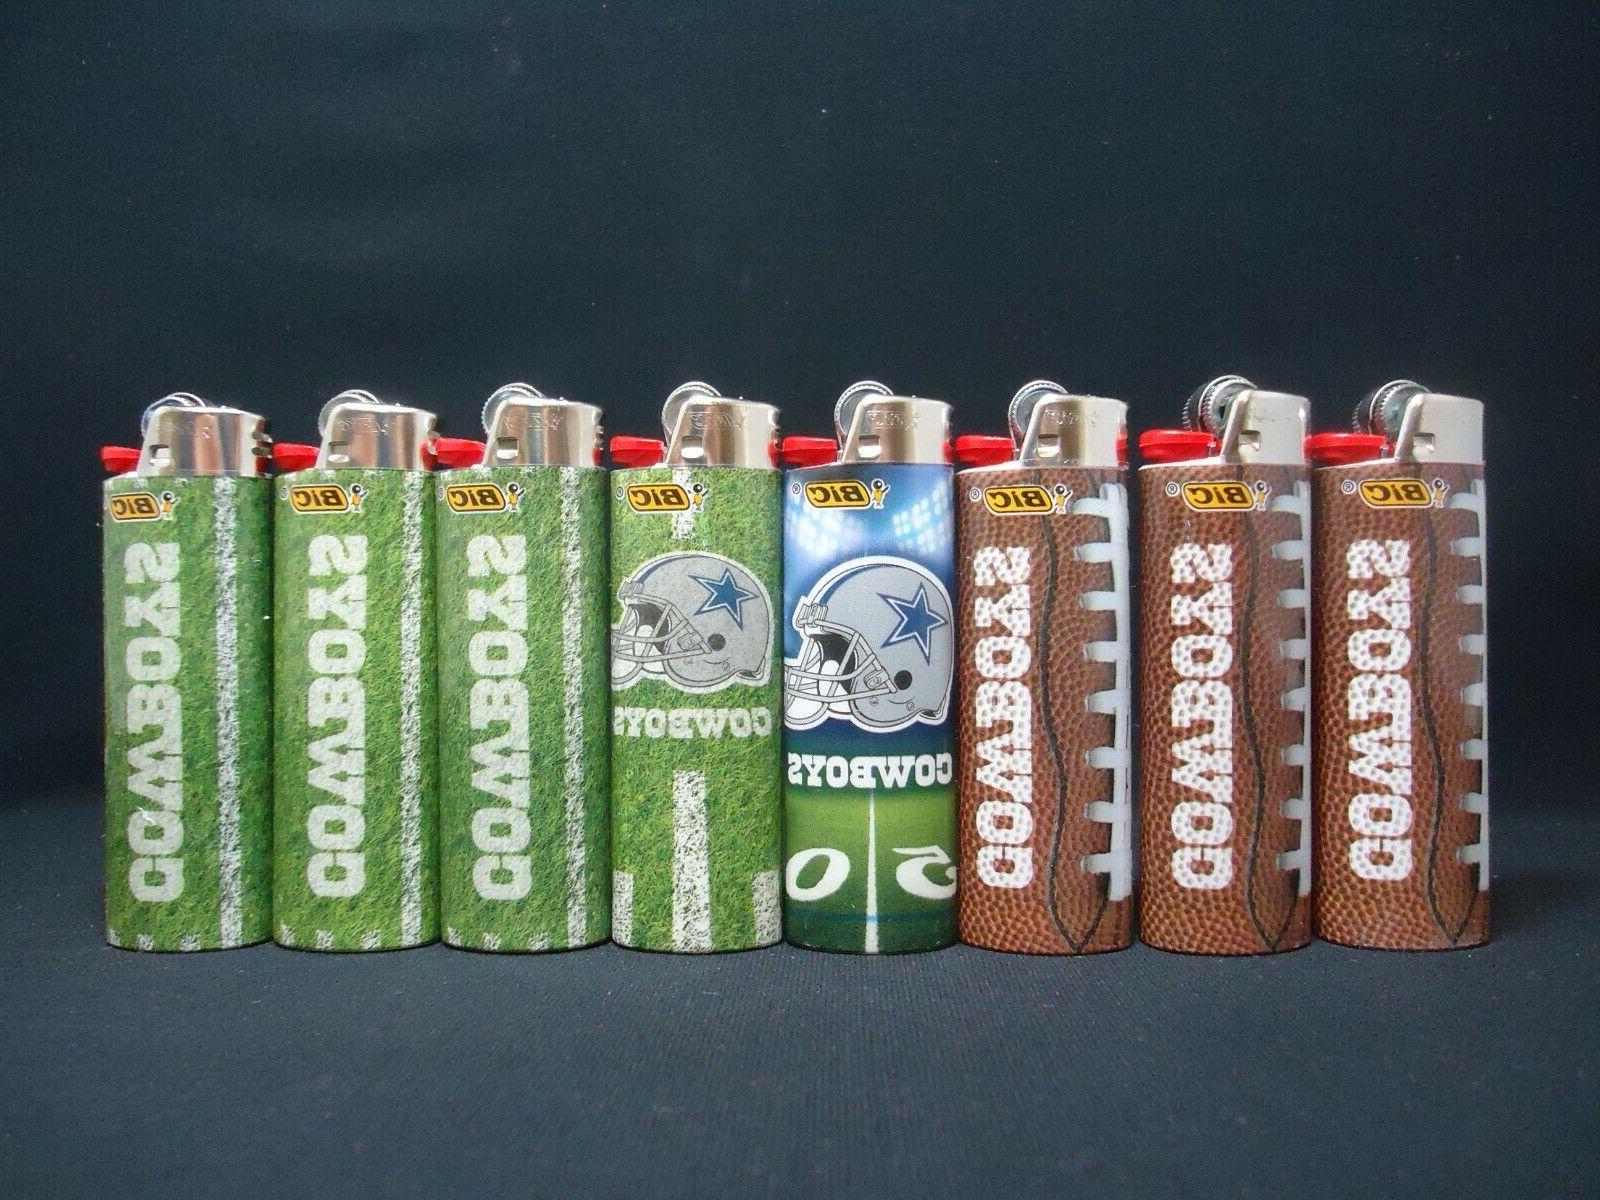 5 Dallas Cowboys Bic Lighters Styles May Vary